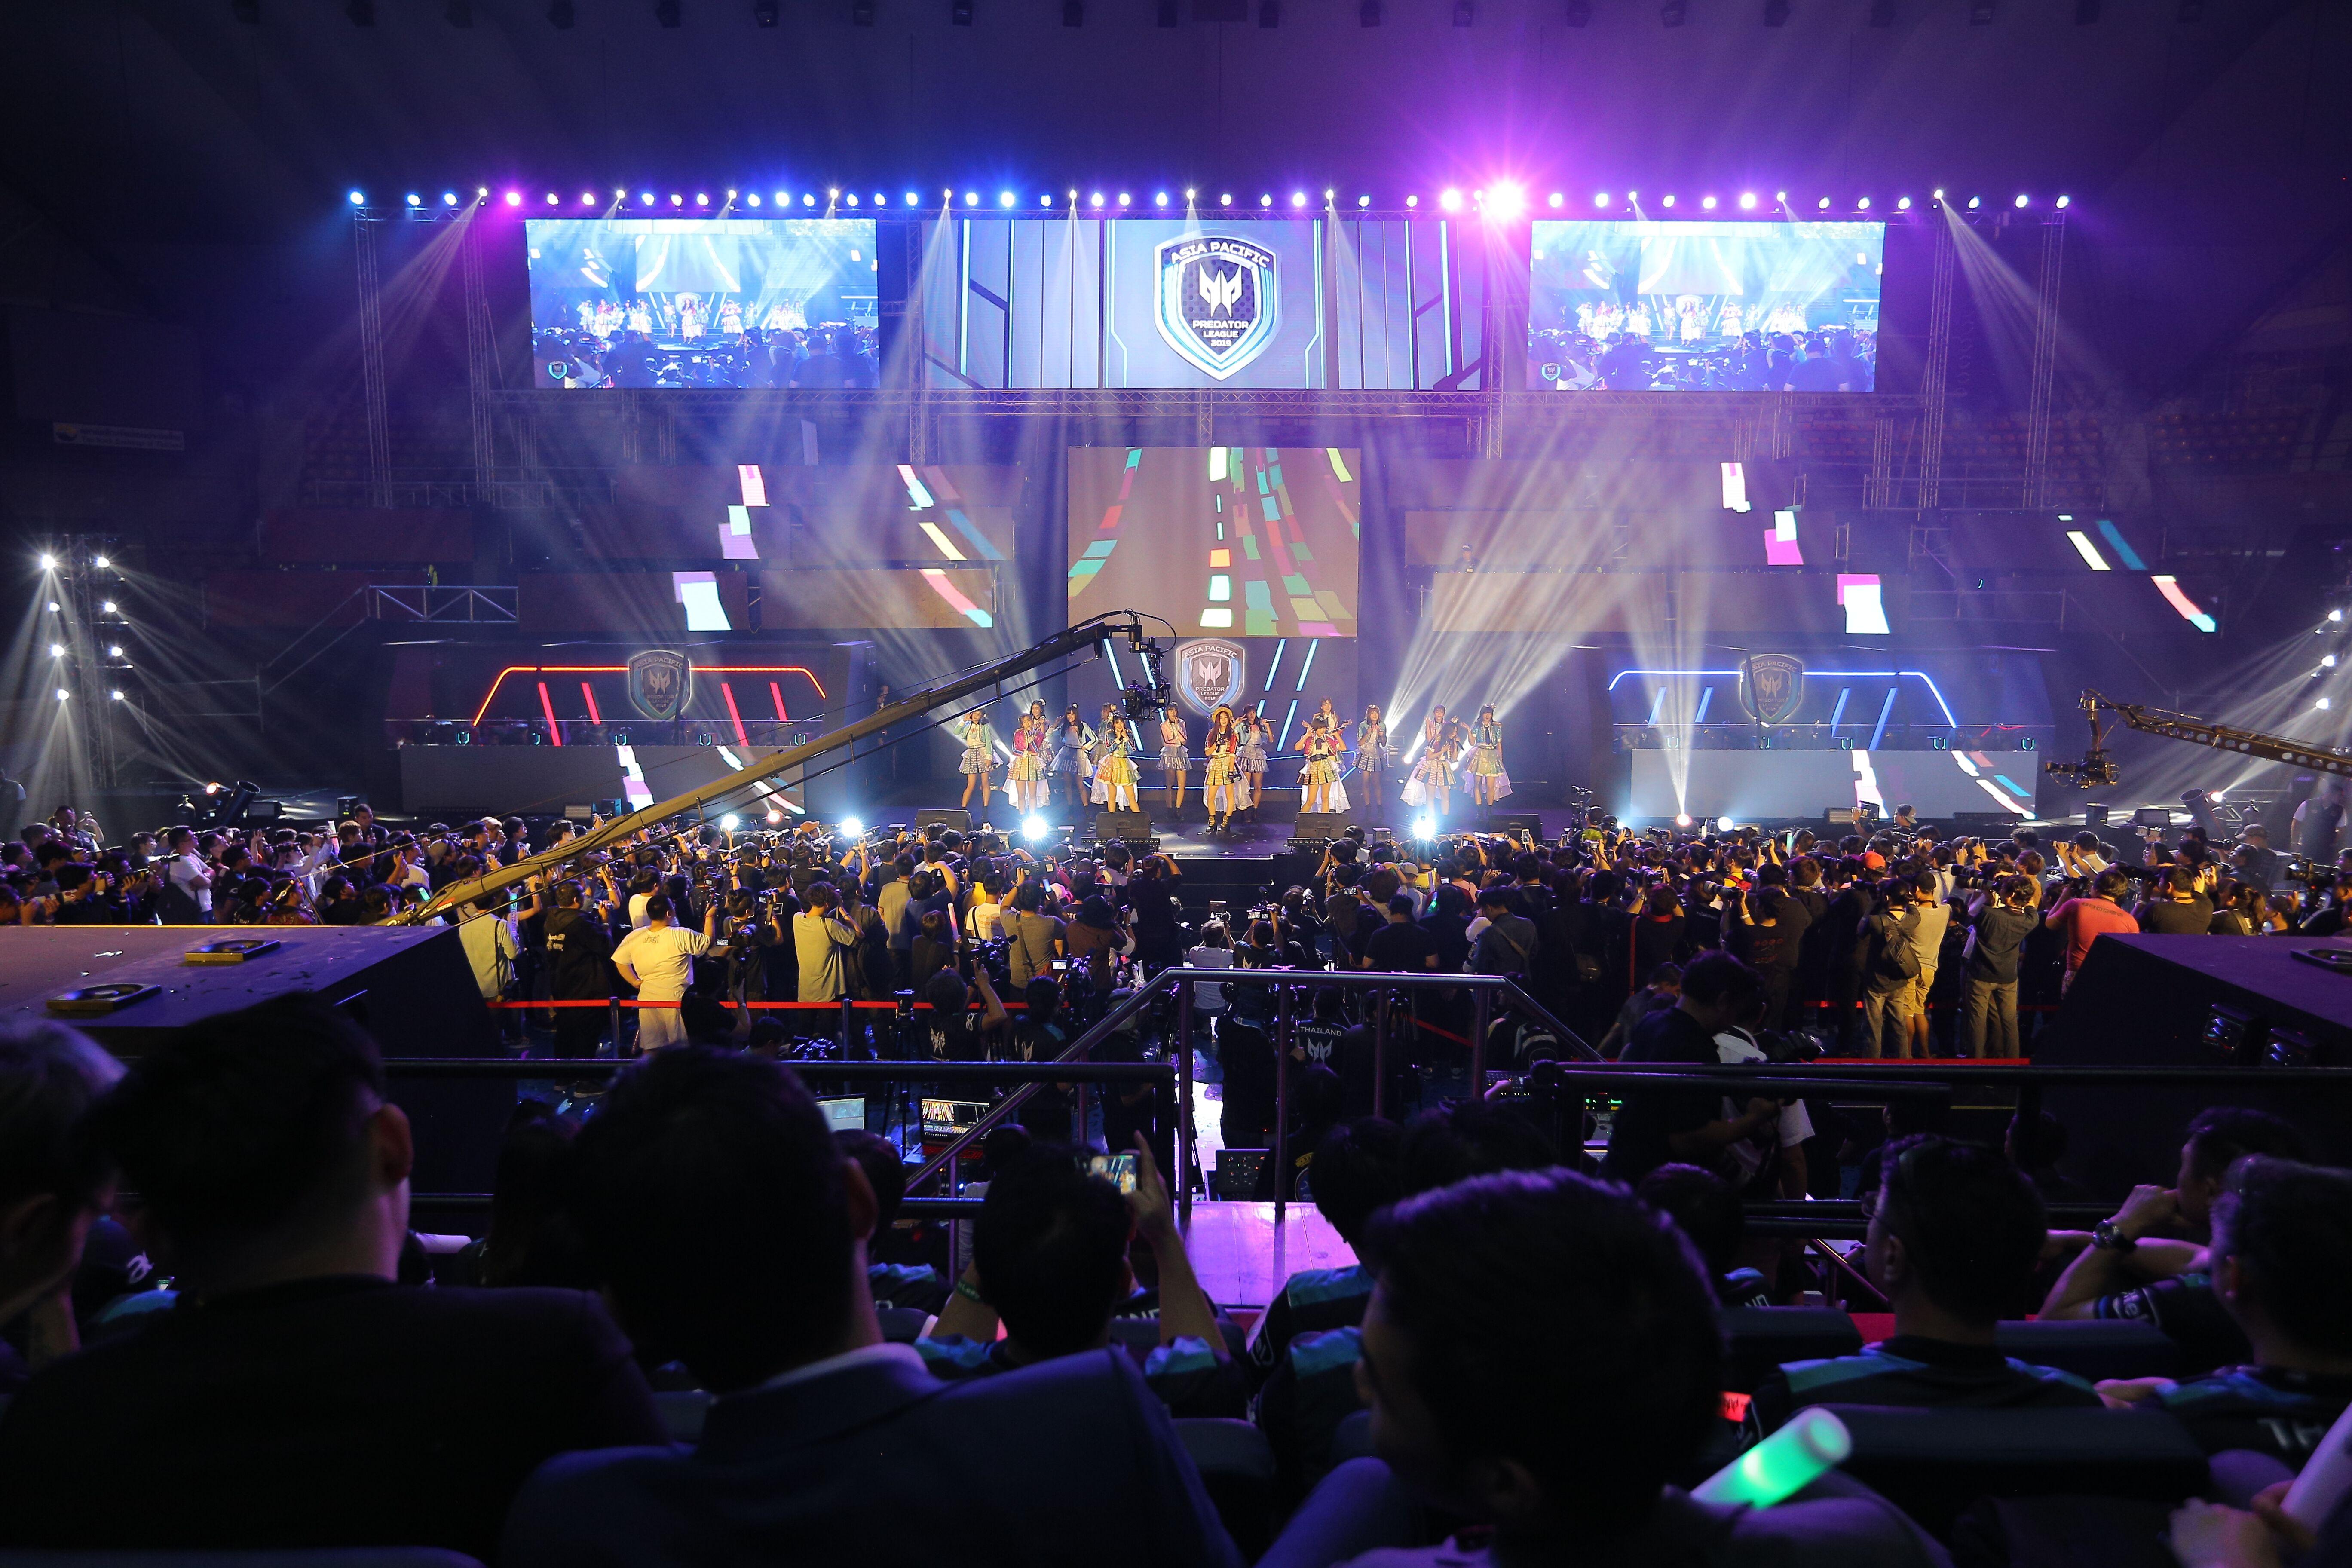 yu87wfdv jpeg บรรยากาศงาน Asia Pacific Predator League 2019 สุดยอดขุนพลทีมอีสปอร์ตเข้าร่วมการแข่งขันรอบแกรนด์ไฟนอล